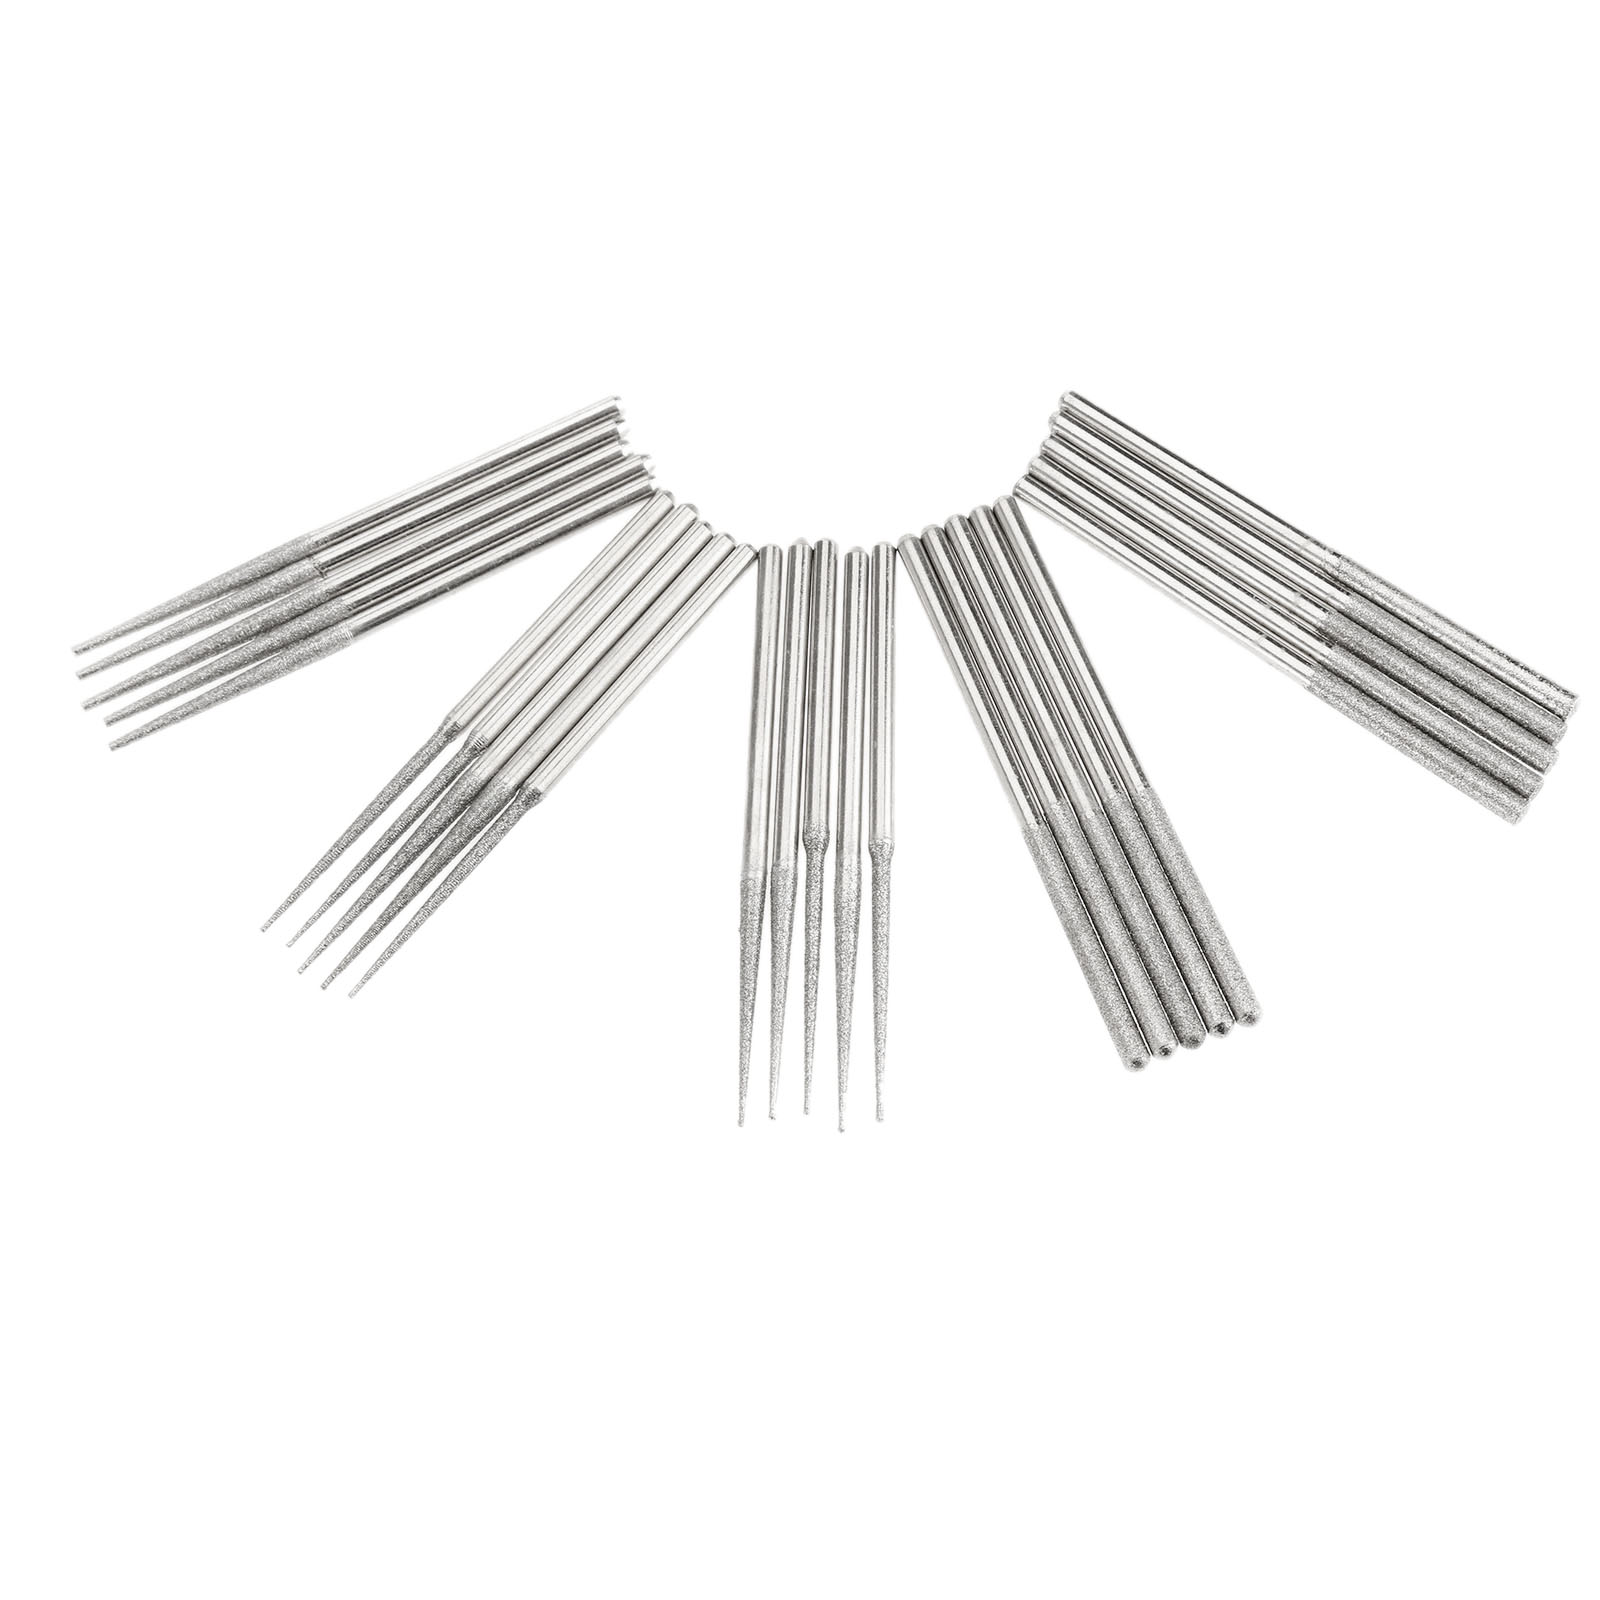 25Pc/set Dremel Accesories Mini Drill Diamond Grinding Head 3mm Shank Bur Bit Set Grinding Tool For Dremel Rotary Tool Polishing